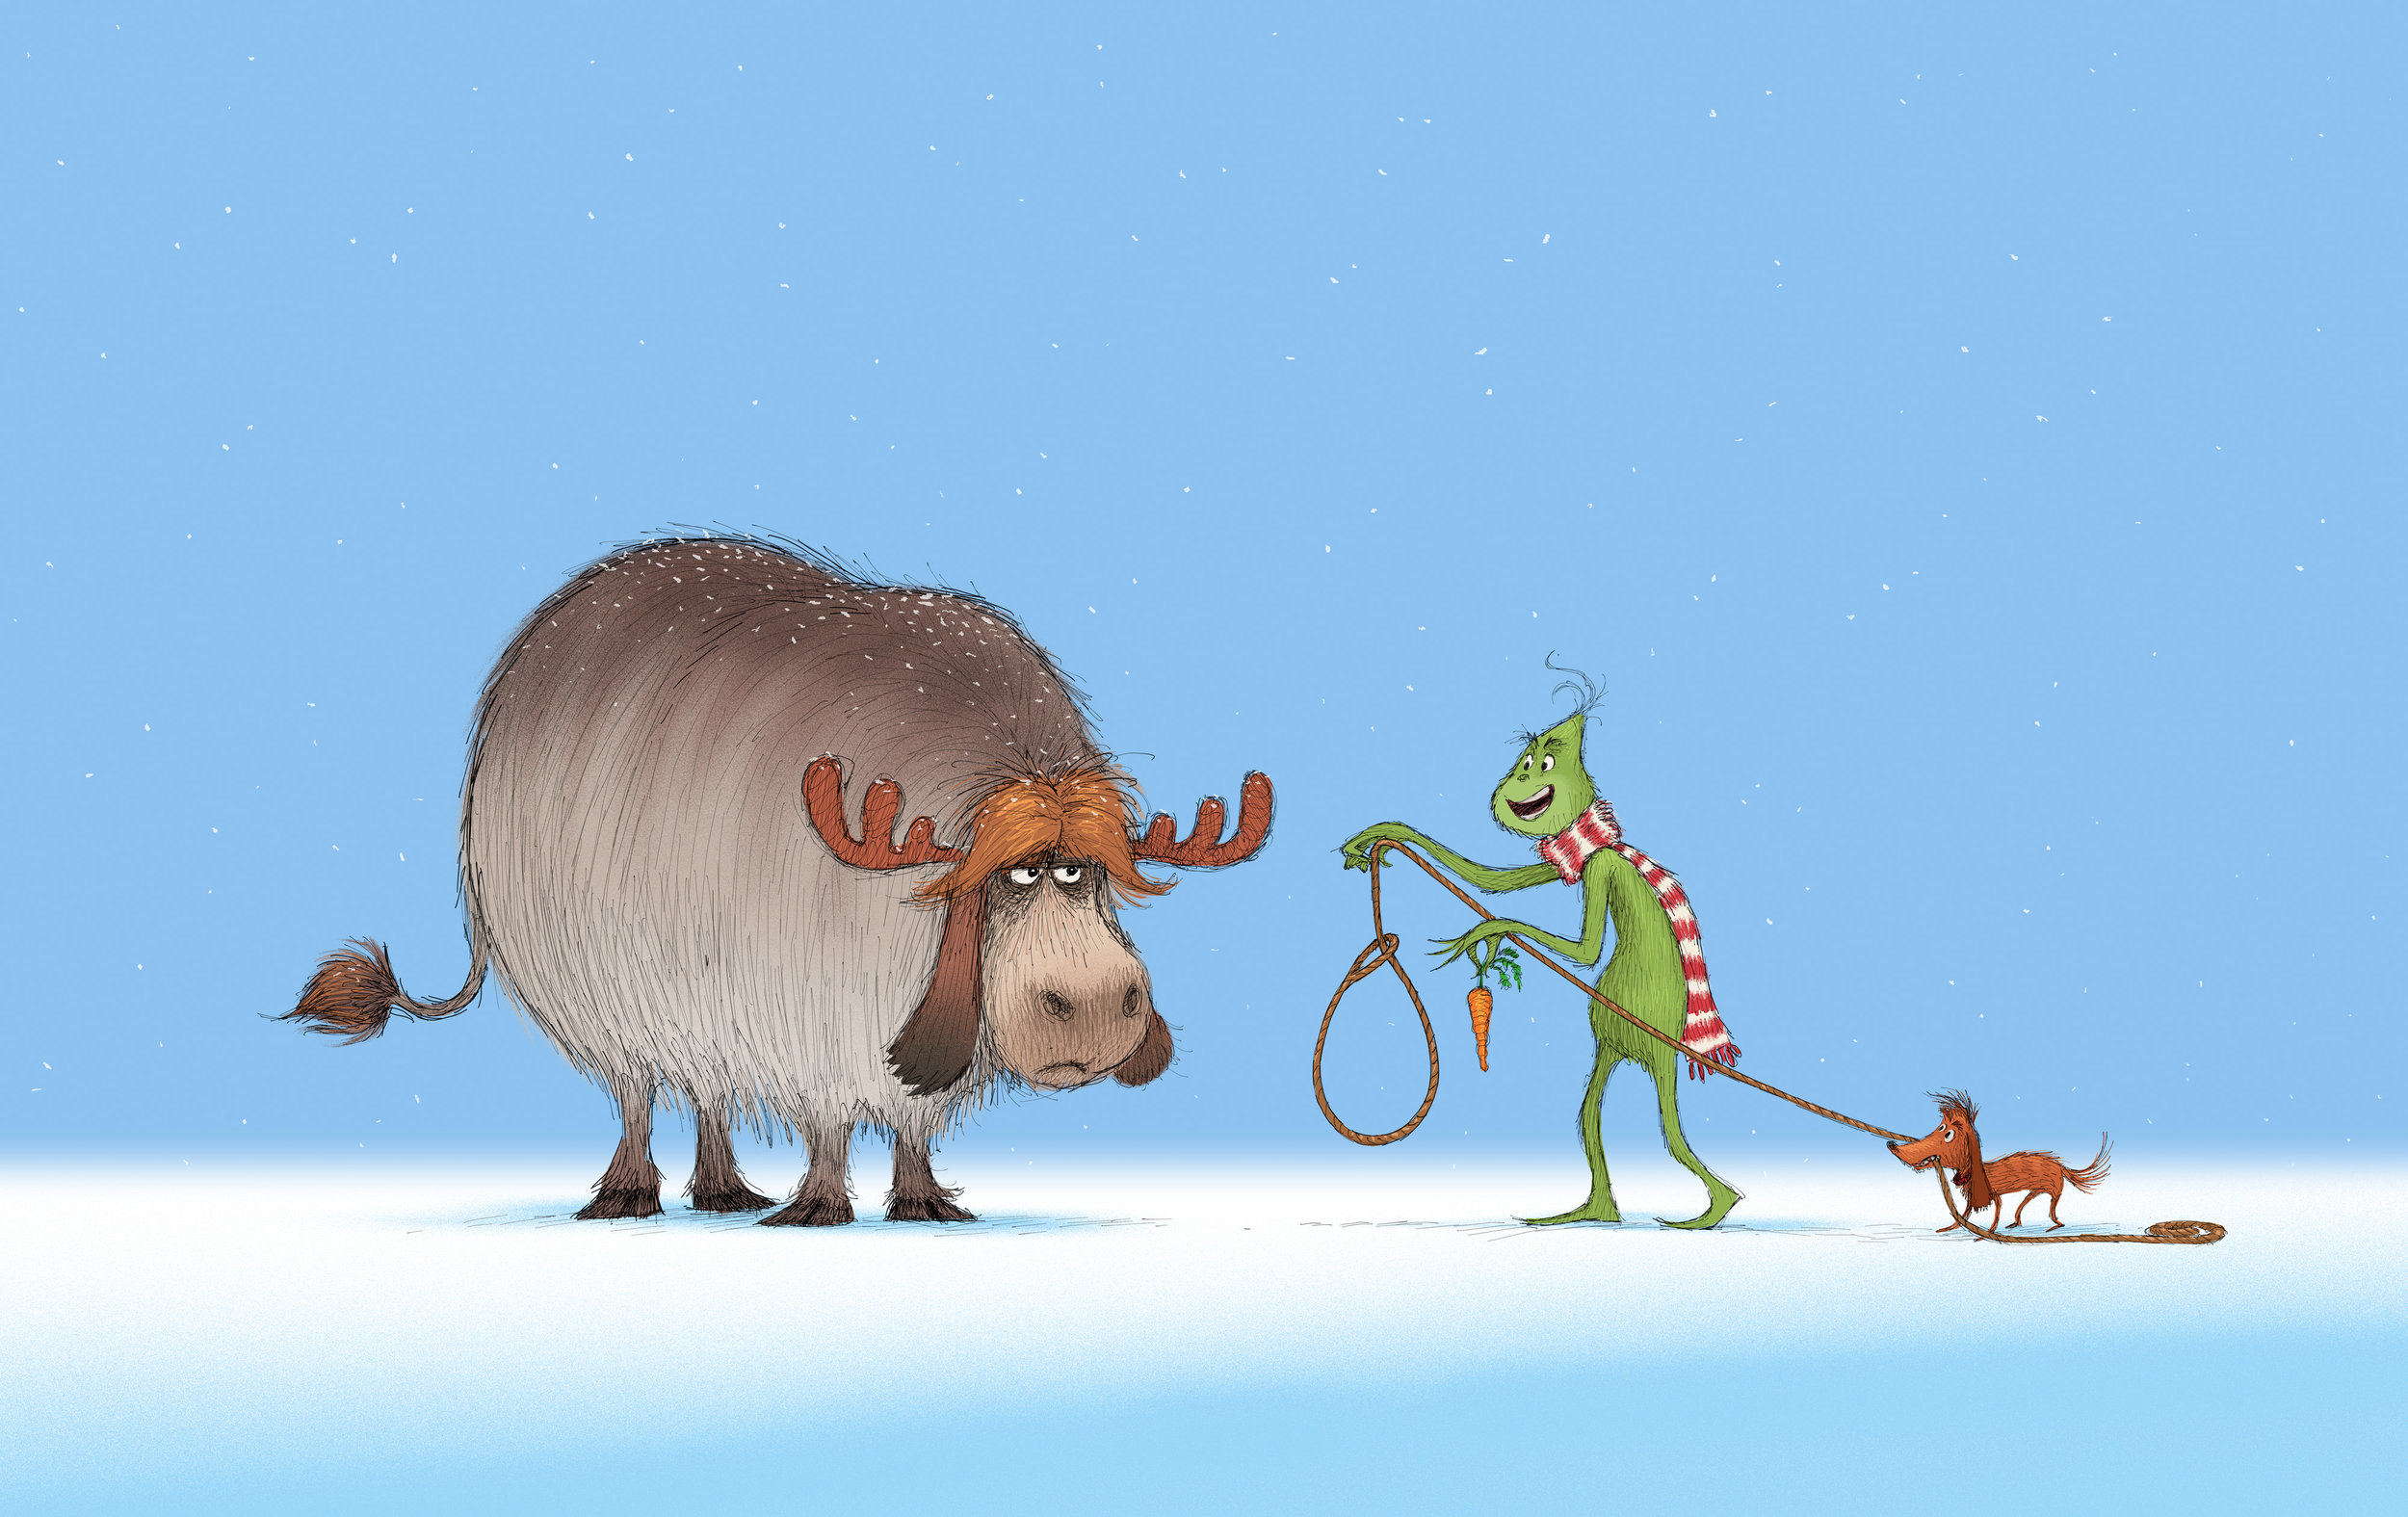 Fat_Reindeer_4K_sRGB.jpg